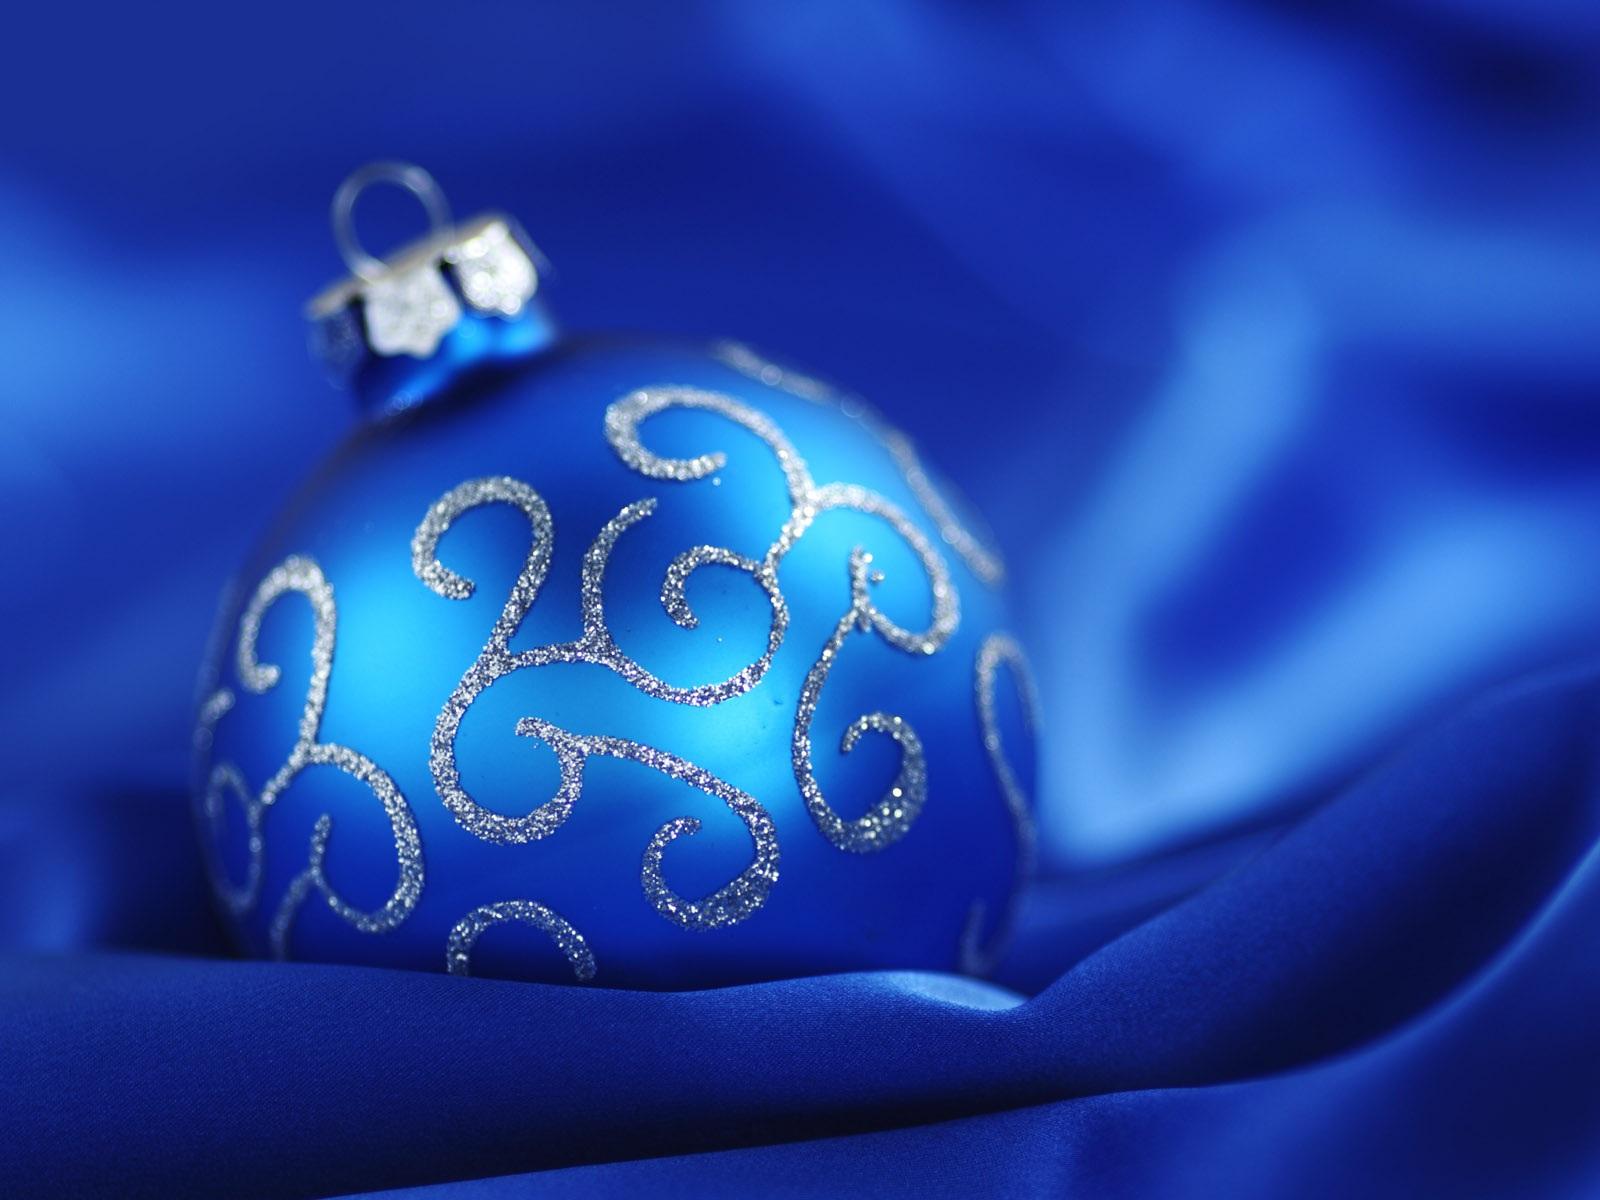 wallpaper blue christmas ball blue background 1920x1200 hd picture image wallpaper blue christmas ball blue